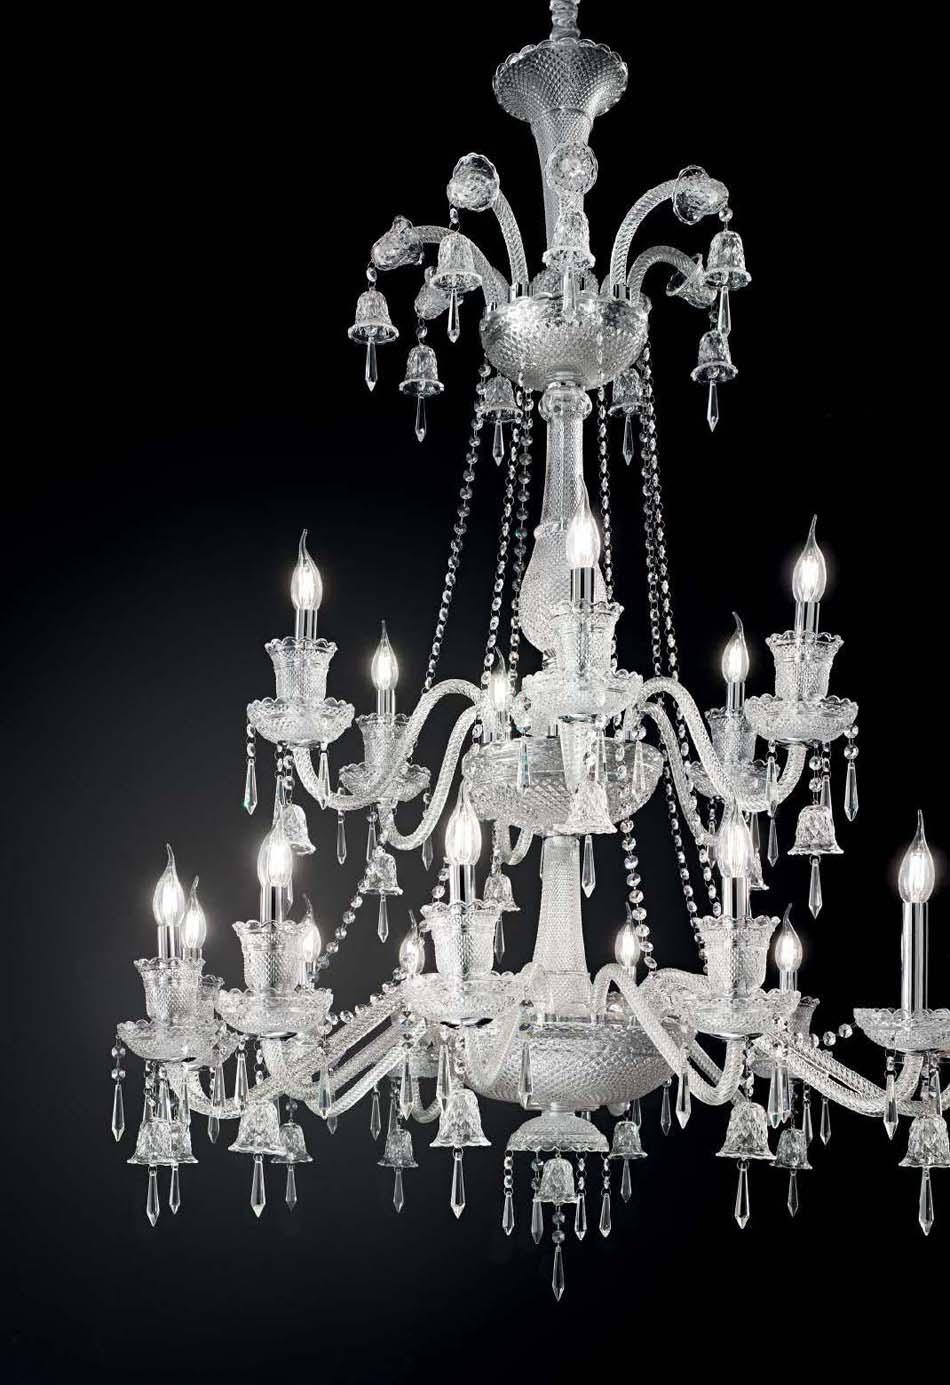 Lampade 36 sospese vintage Ideal Lux redentore – Toscana Arredamenti